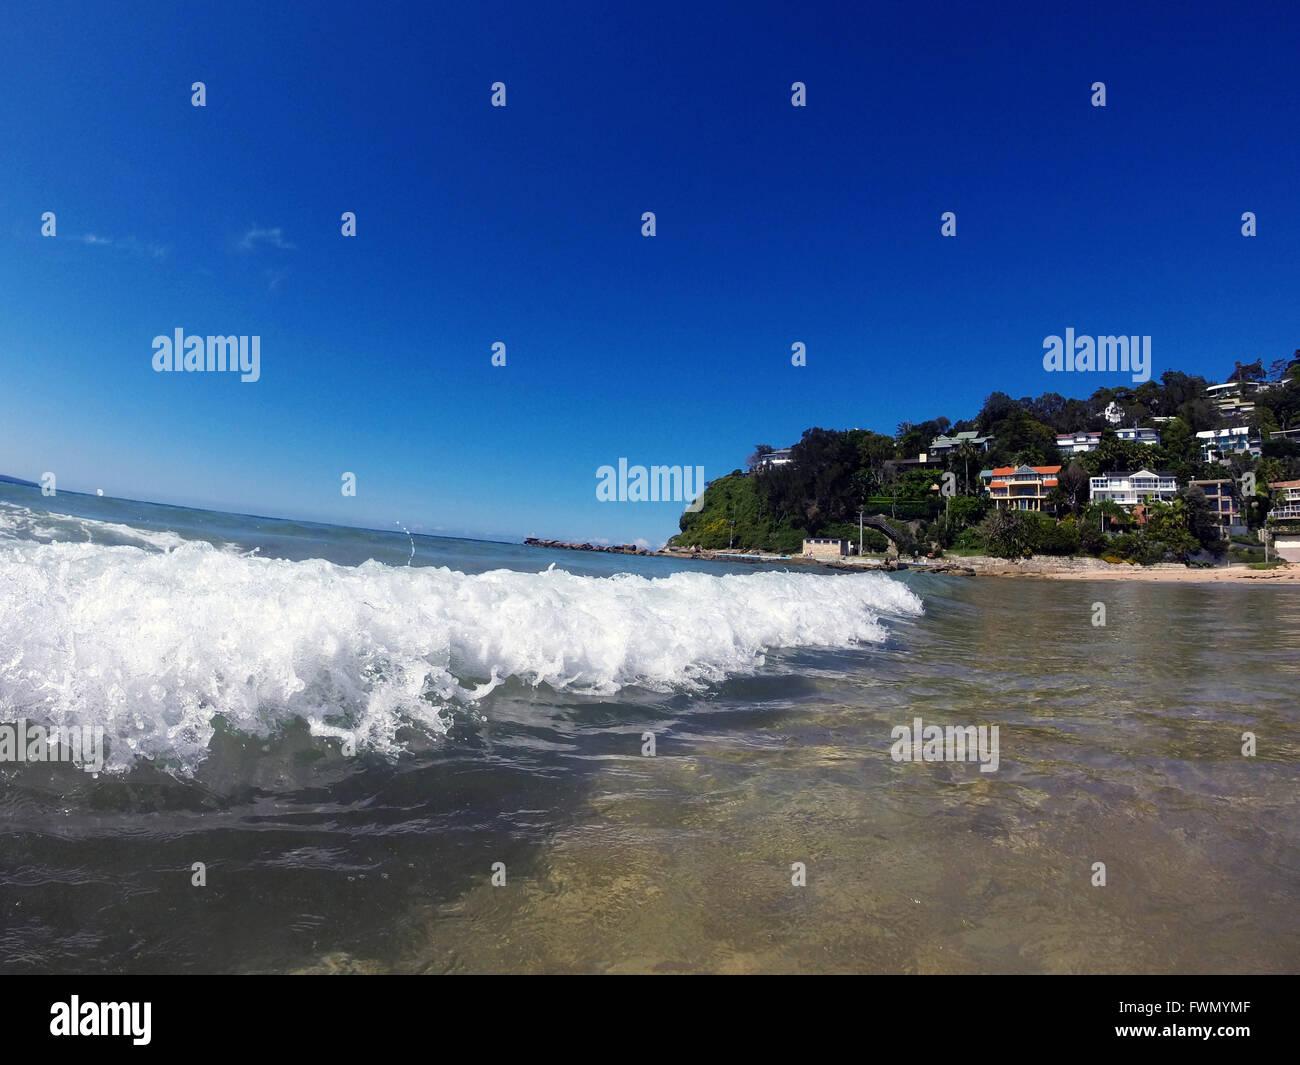 Palm Beach, northern Sydney, NSW, Australia. No PR - Stock Image